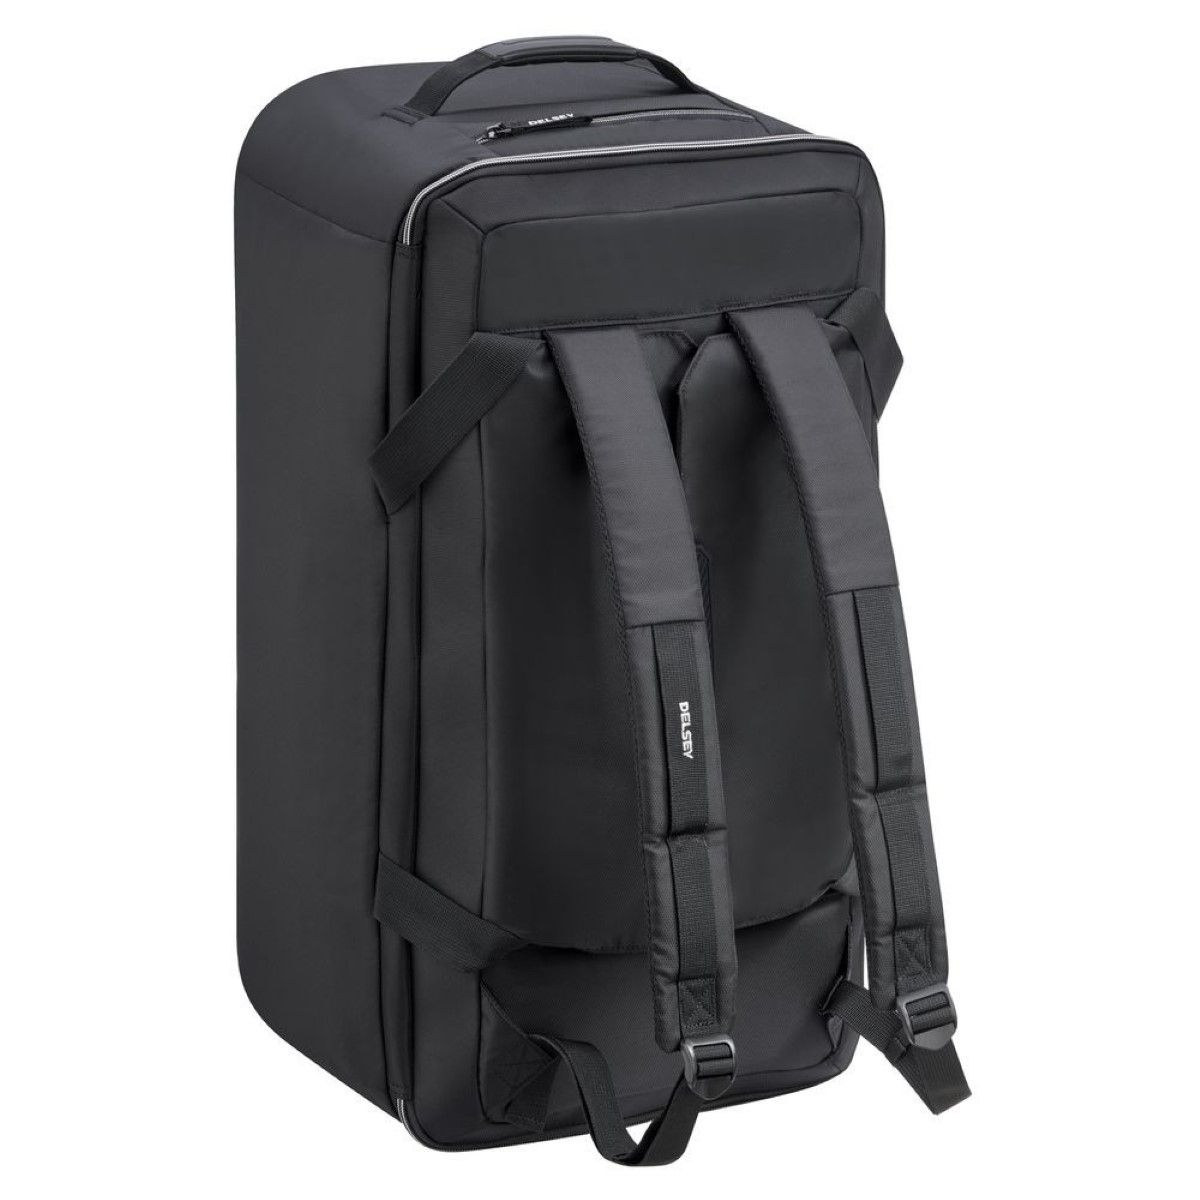 Convertible Travel Bag Tramontane 68 cm Delsey NERO